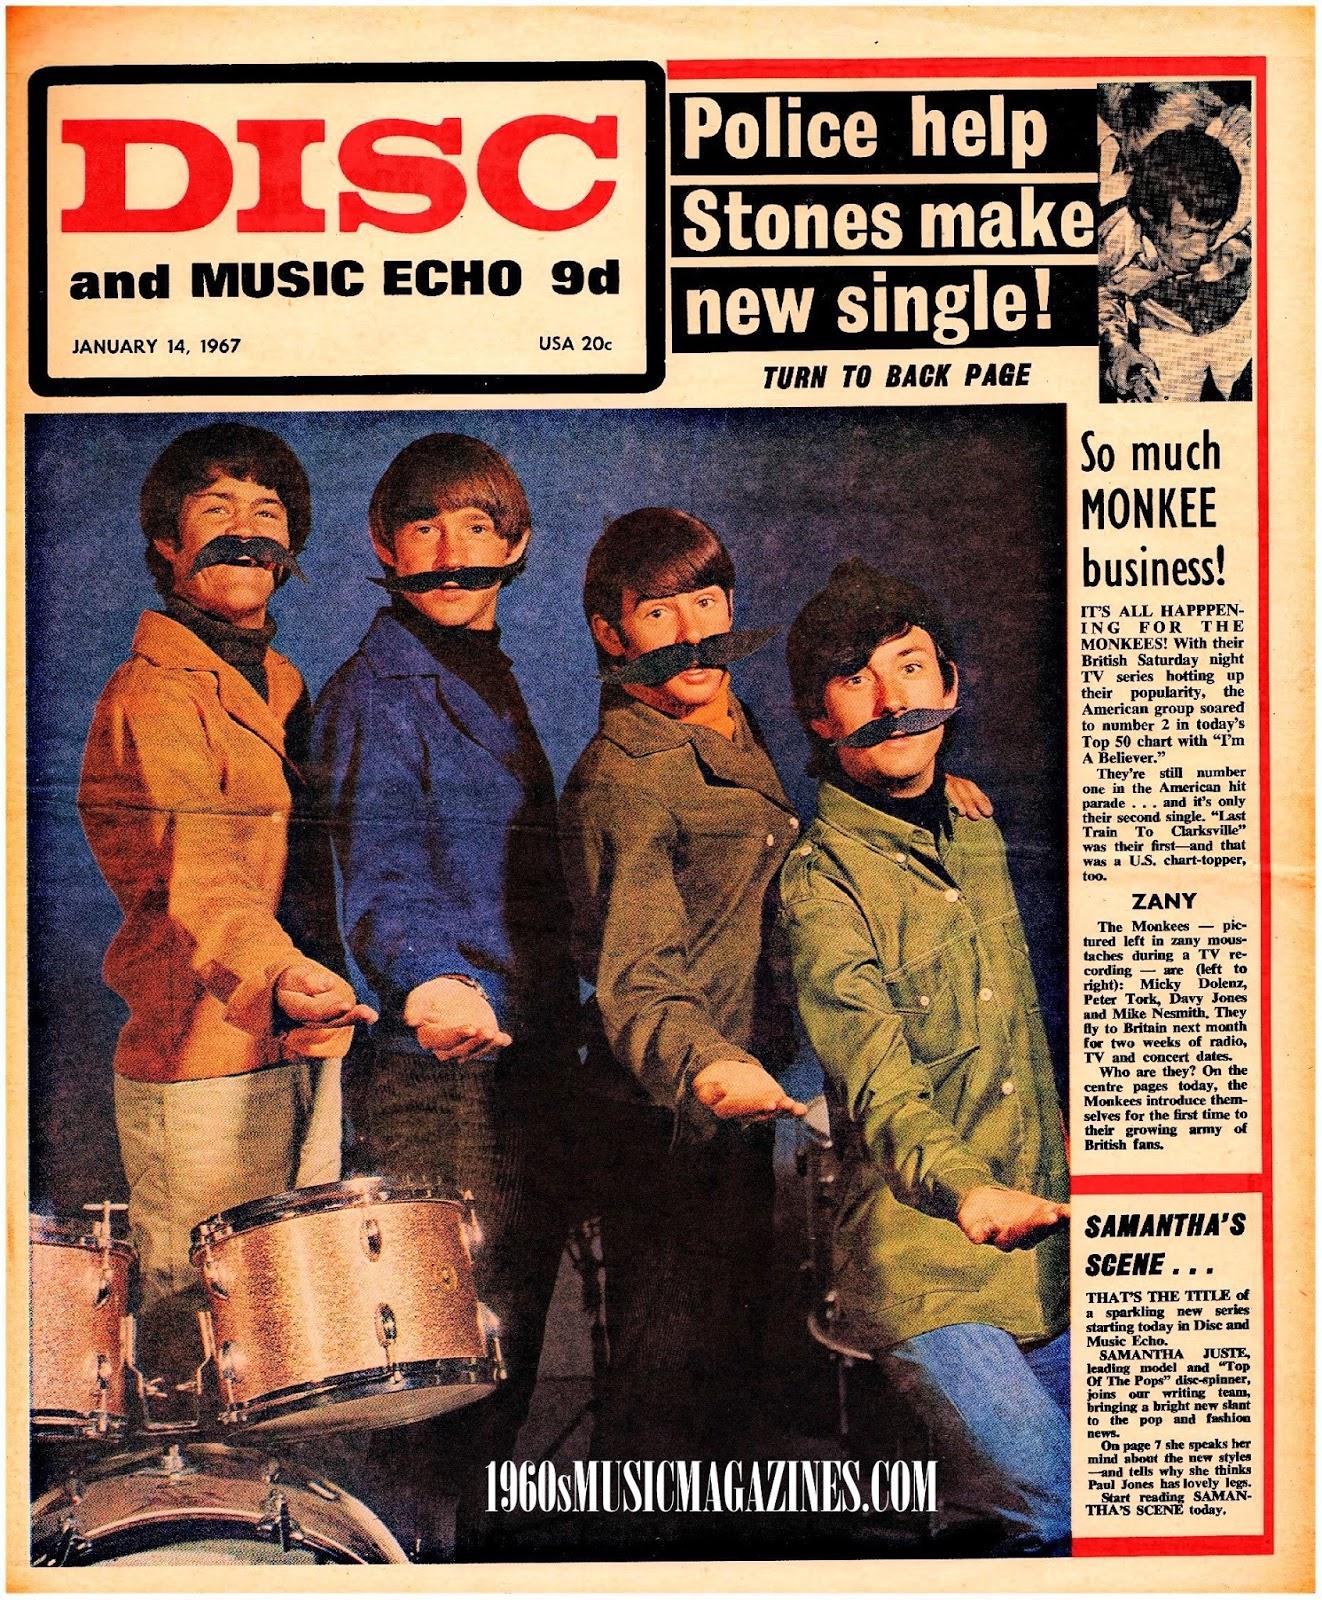 1960s MUSIC MAGAZINES.COM